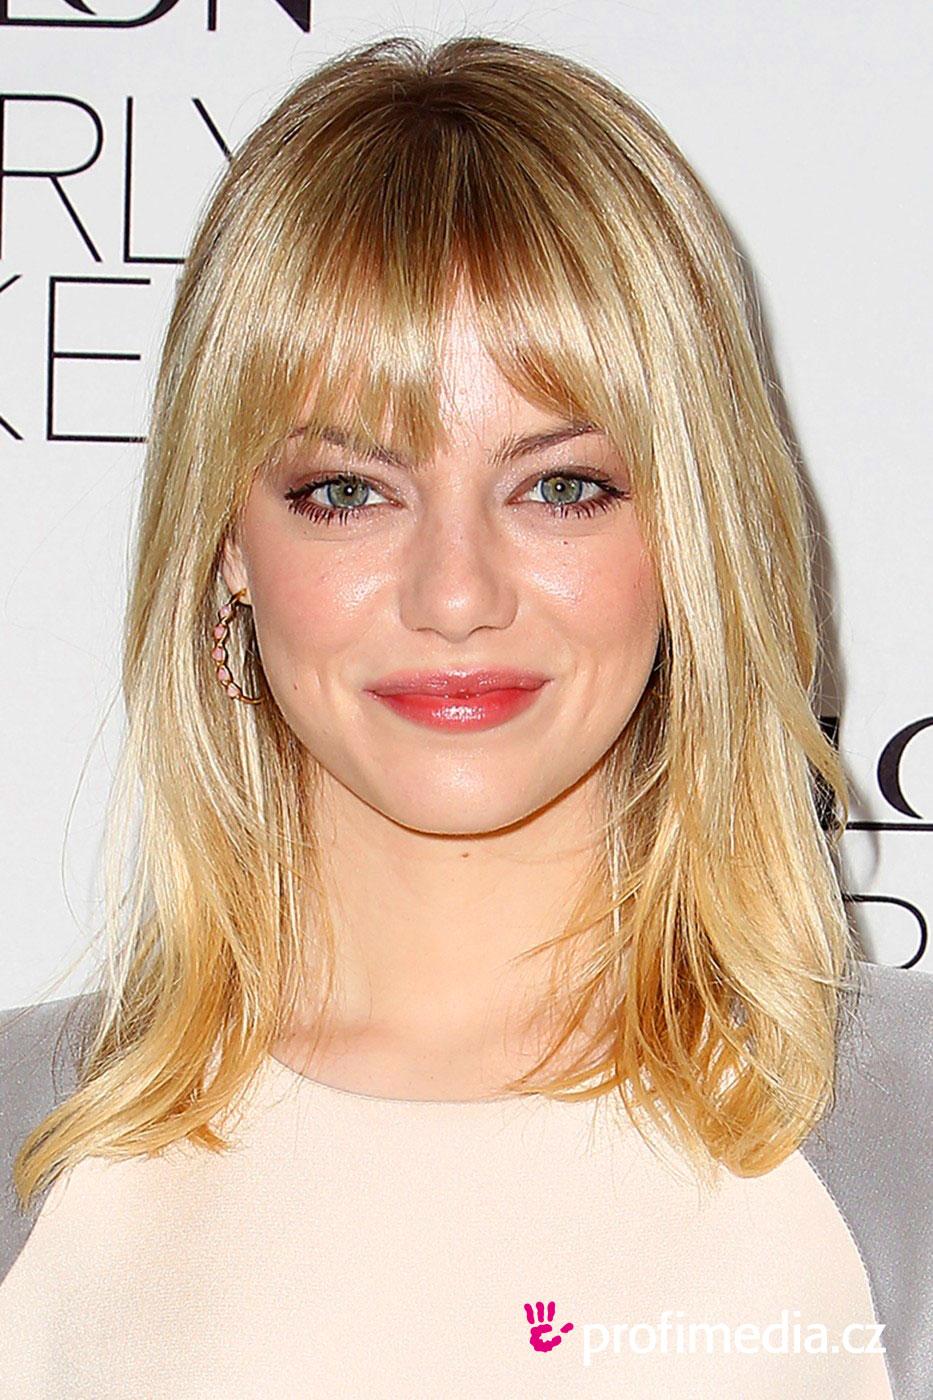 Emma Stone Hairstyle Easyhairstyler